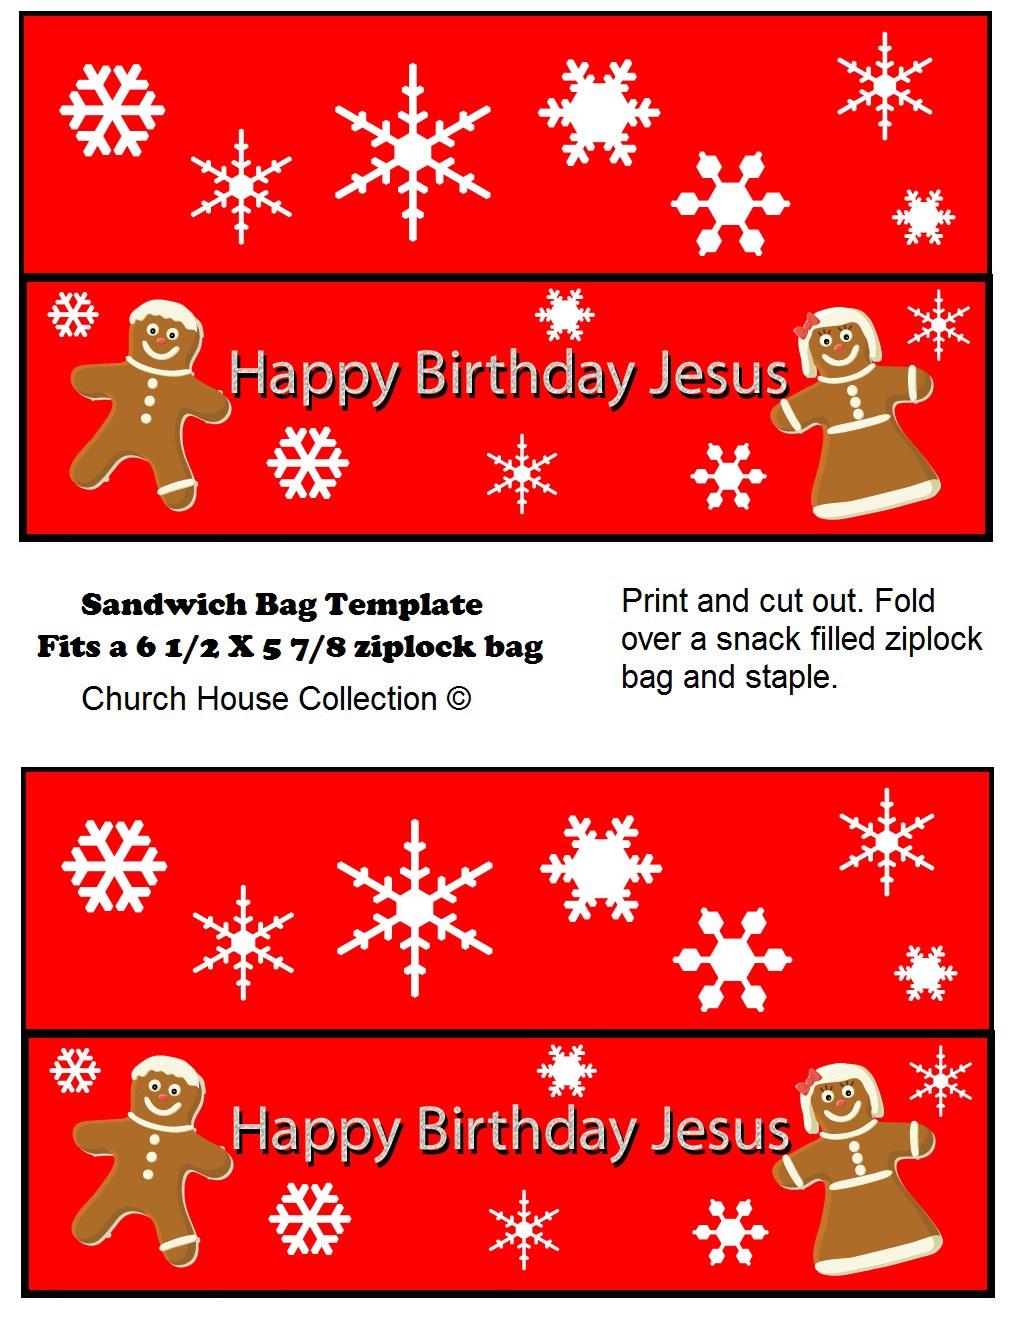 Church House Collection Blog Christmas Happy Birthday